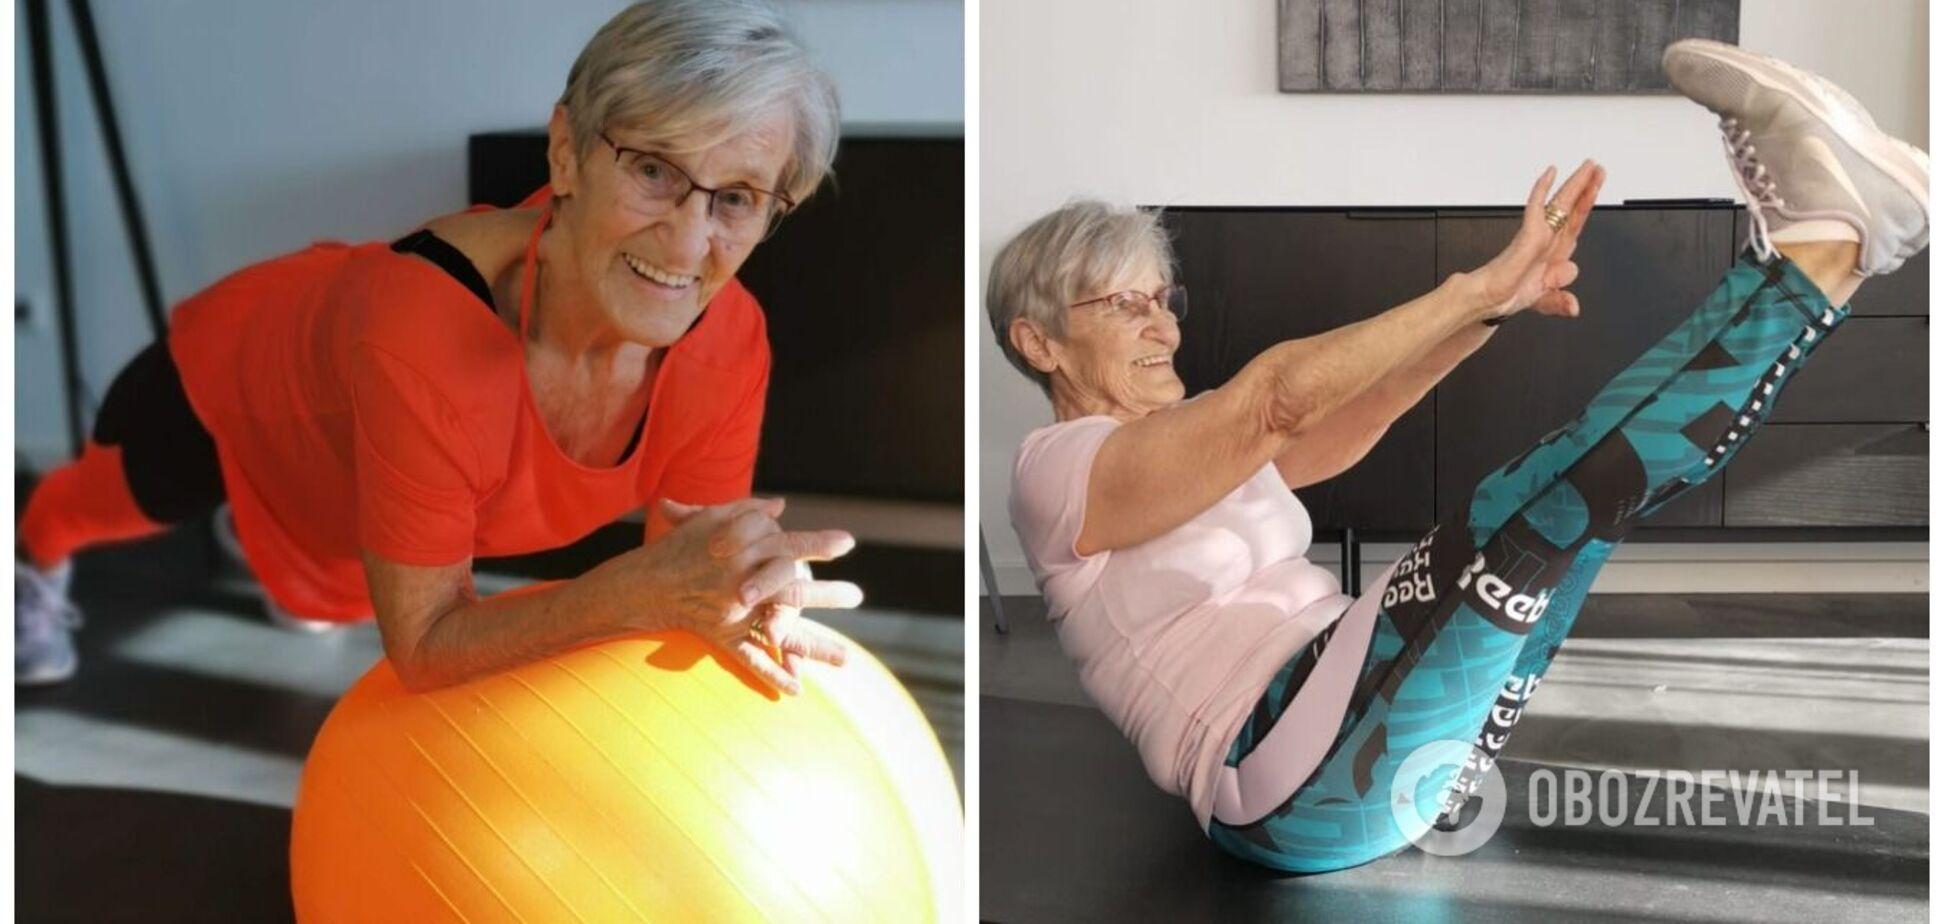 81-летняя фитнес-модель покорила TikTok. Видео